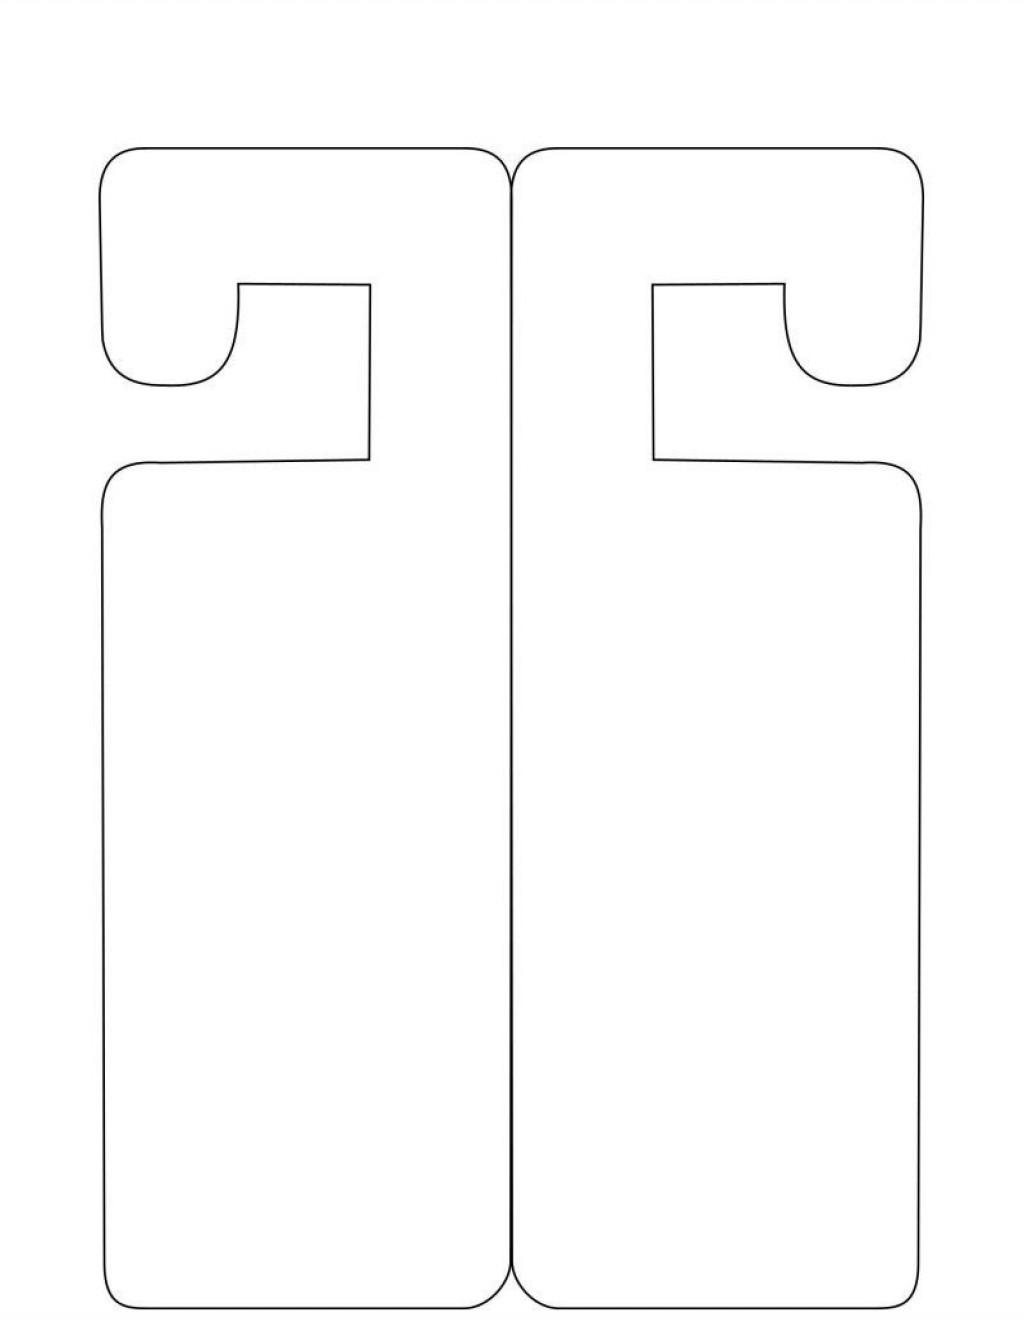 001 Incredible Door Hanger Template For Word Inspiration  Download Free Wedding MicrosoftLarge